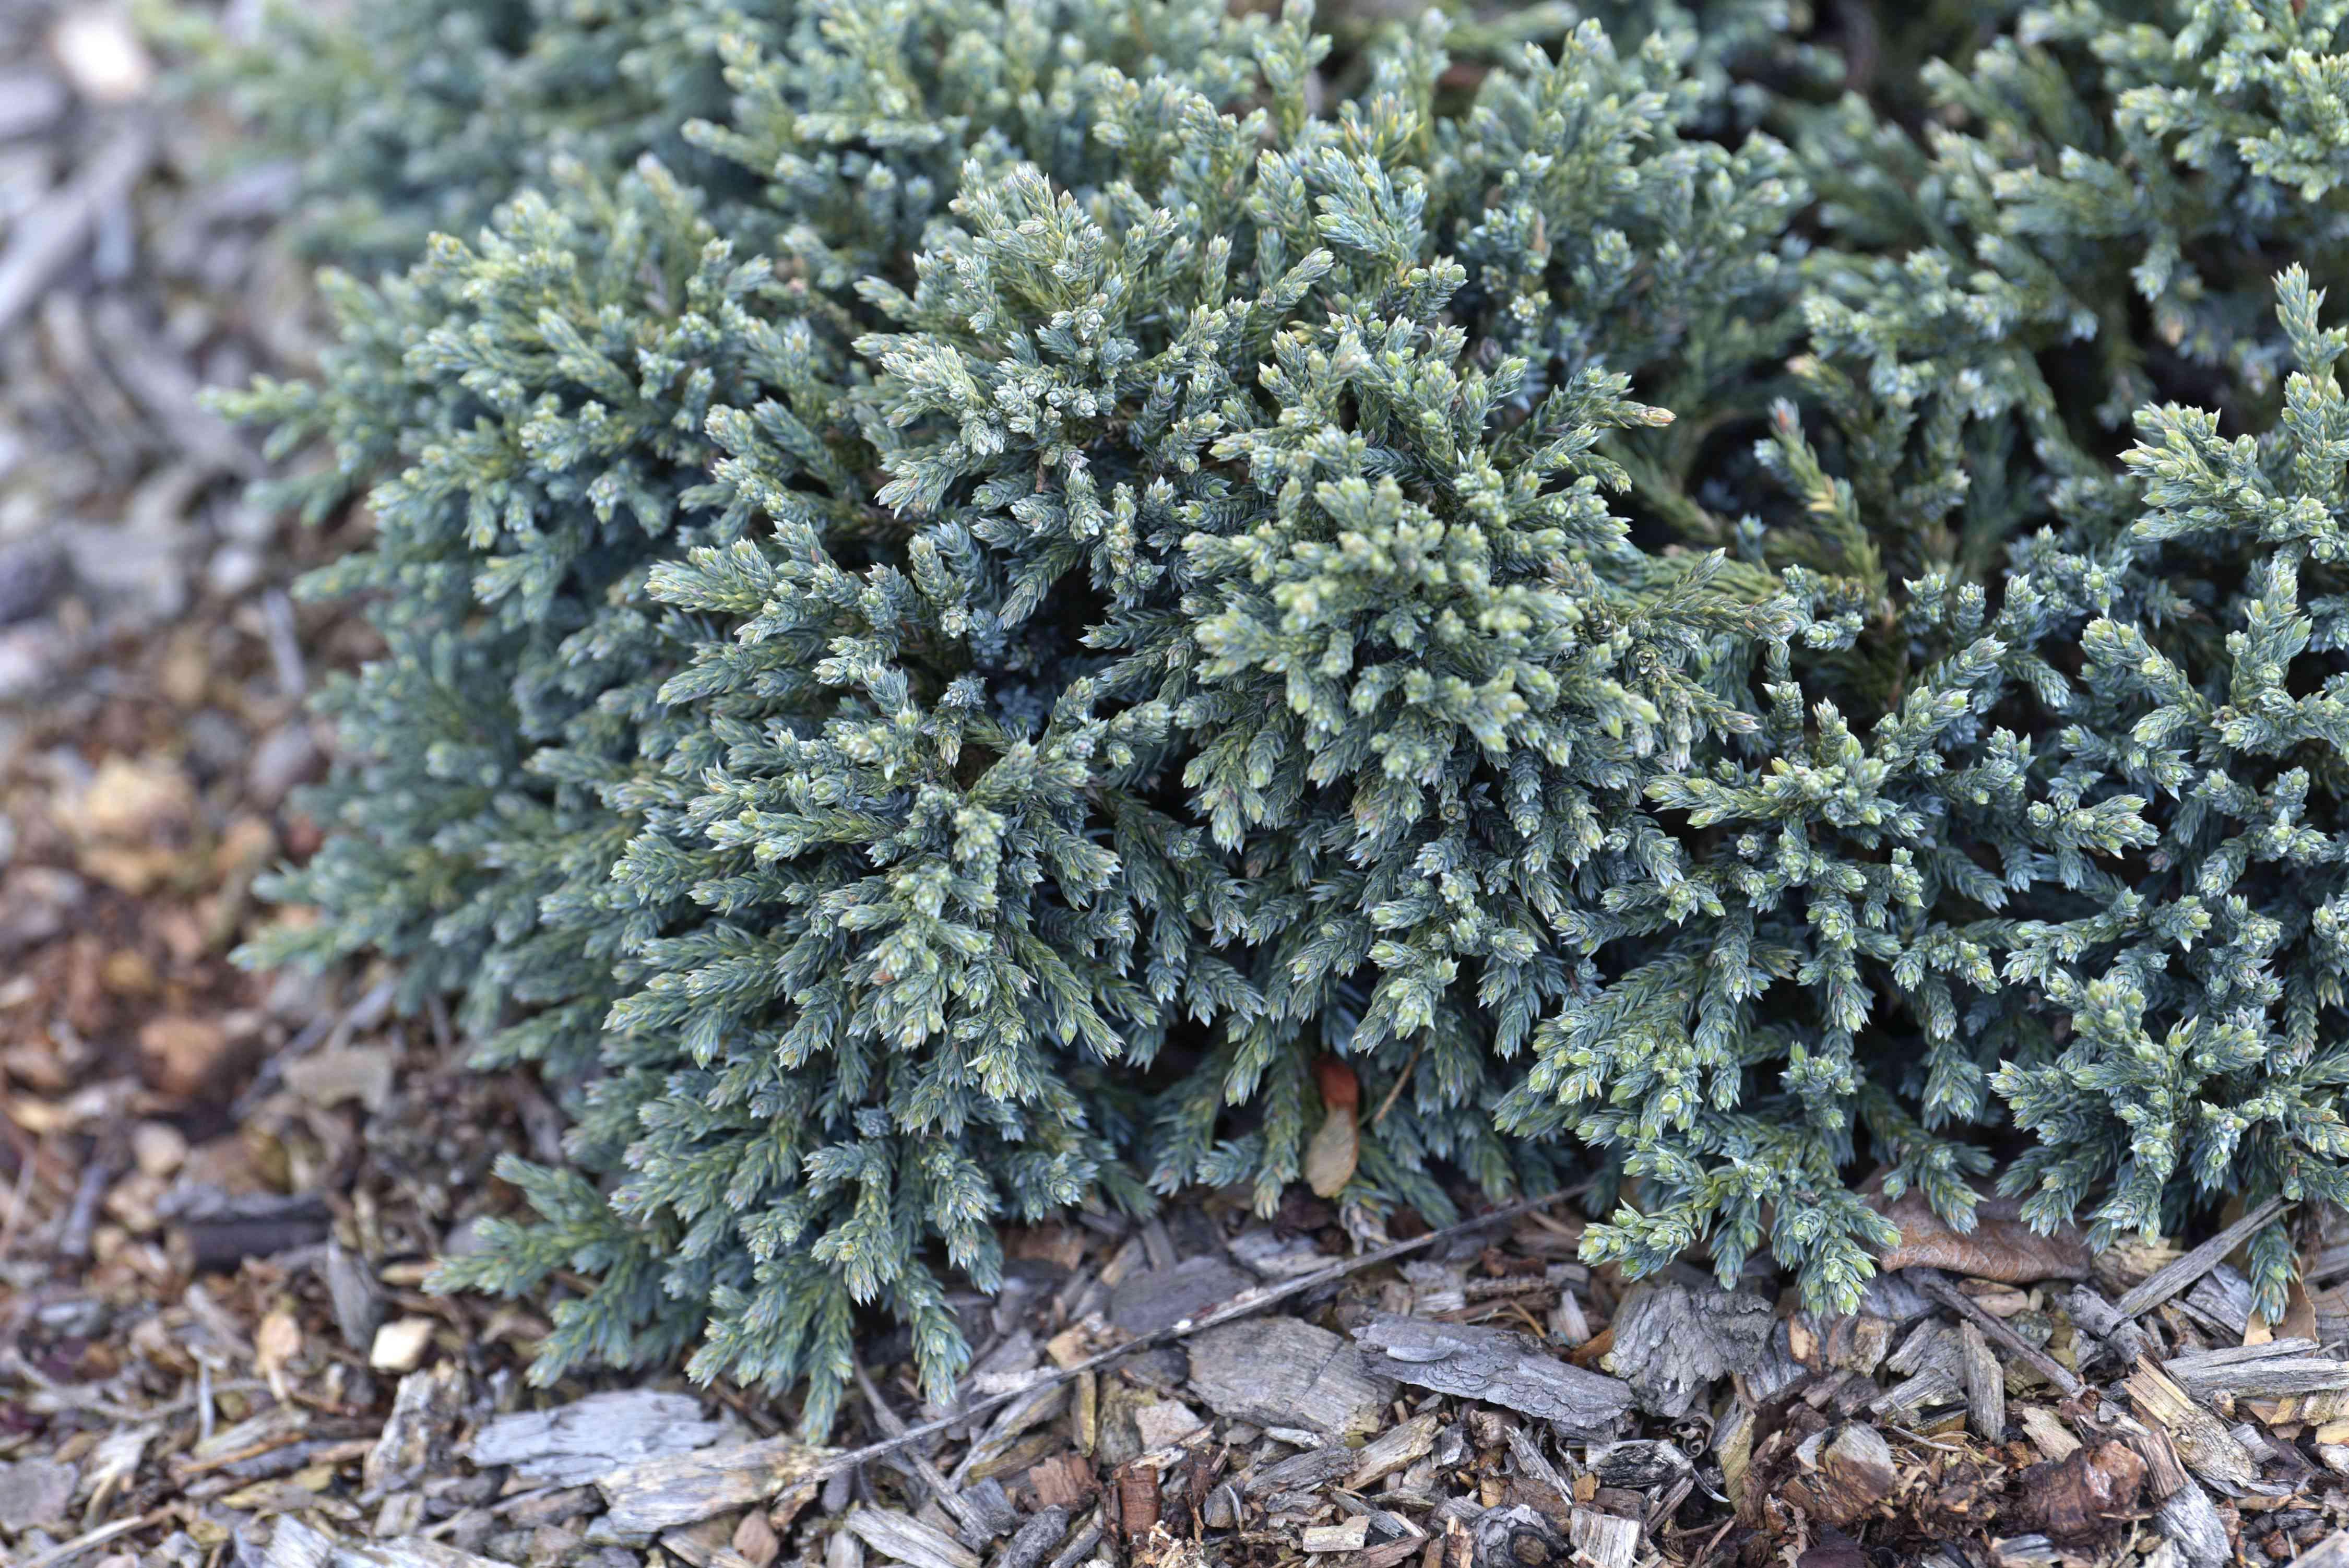 'Blue Star' juniper shrub with small silvery-blue needles above mulch